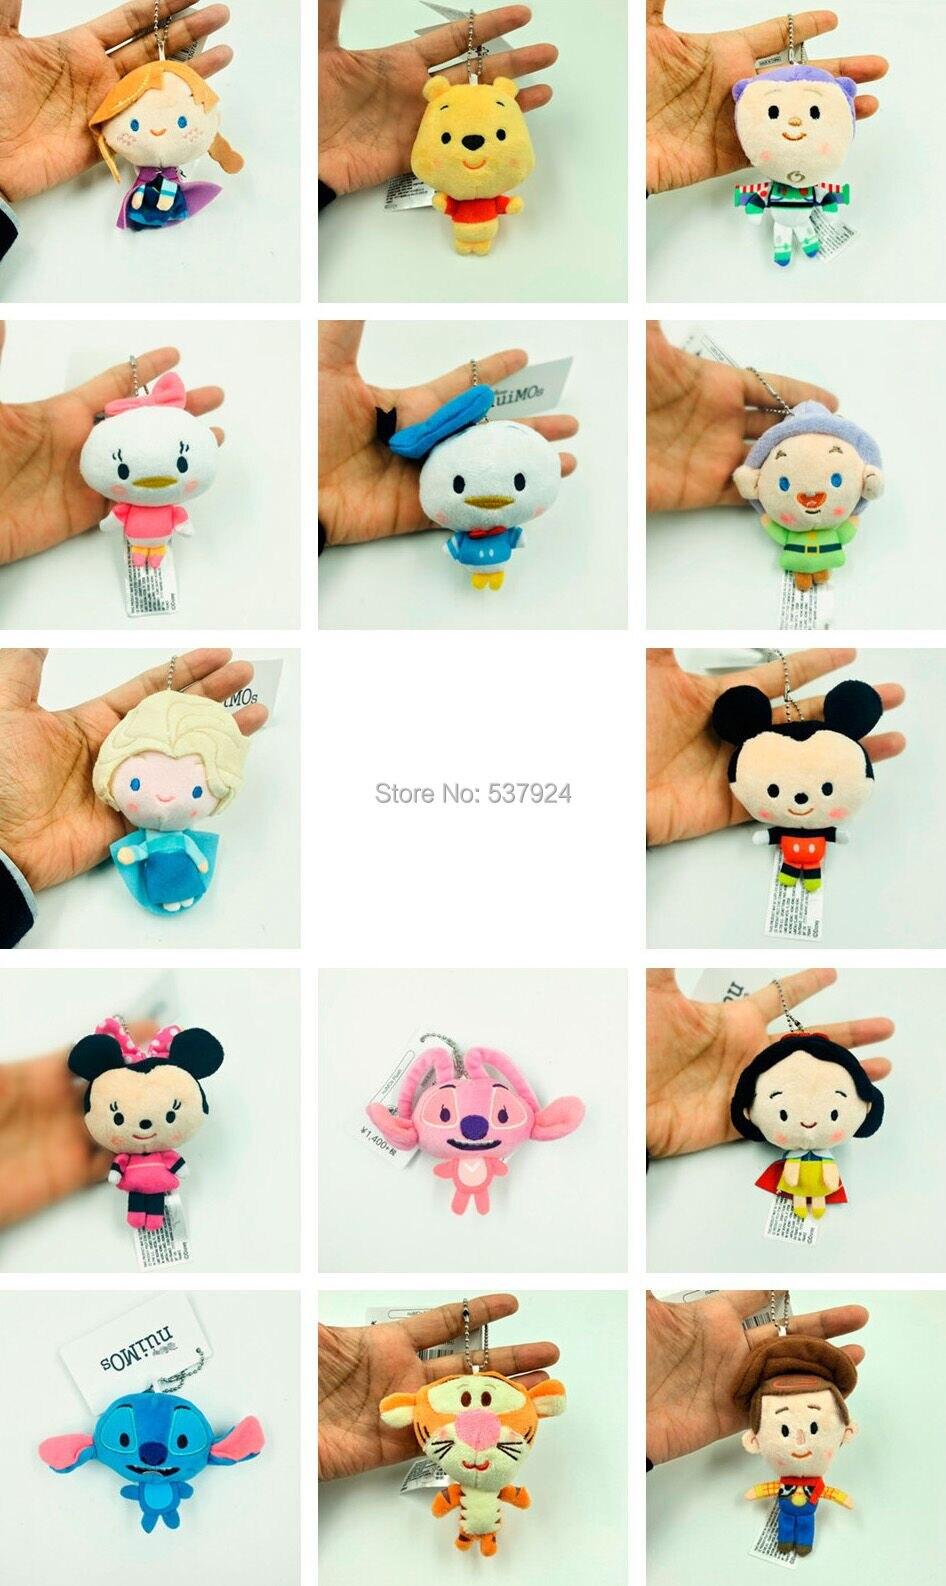 Toys & Hobbies Dolls & Stuffed Toys Plush Mickey Plush Doll Bow Animal Elephant Donald Duck Plush Bag Pendant Toys Baby Fat Round Stitch Bears Toys For Children